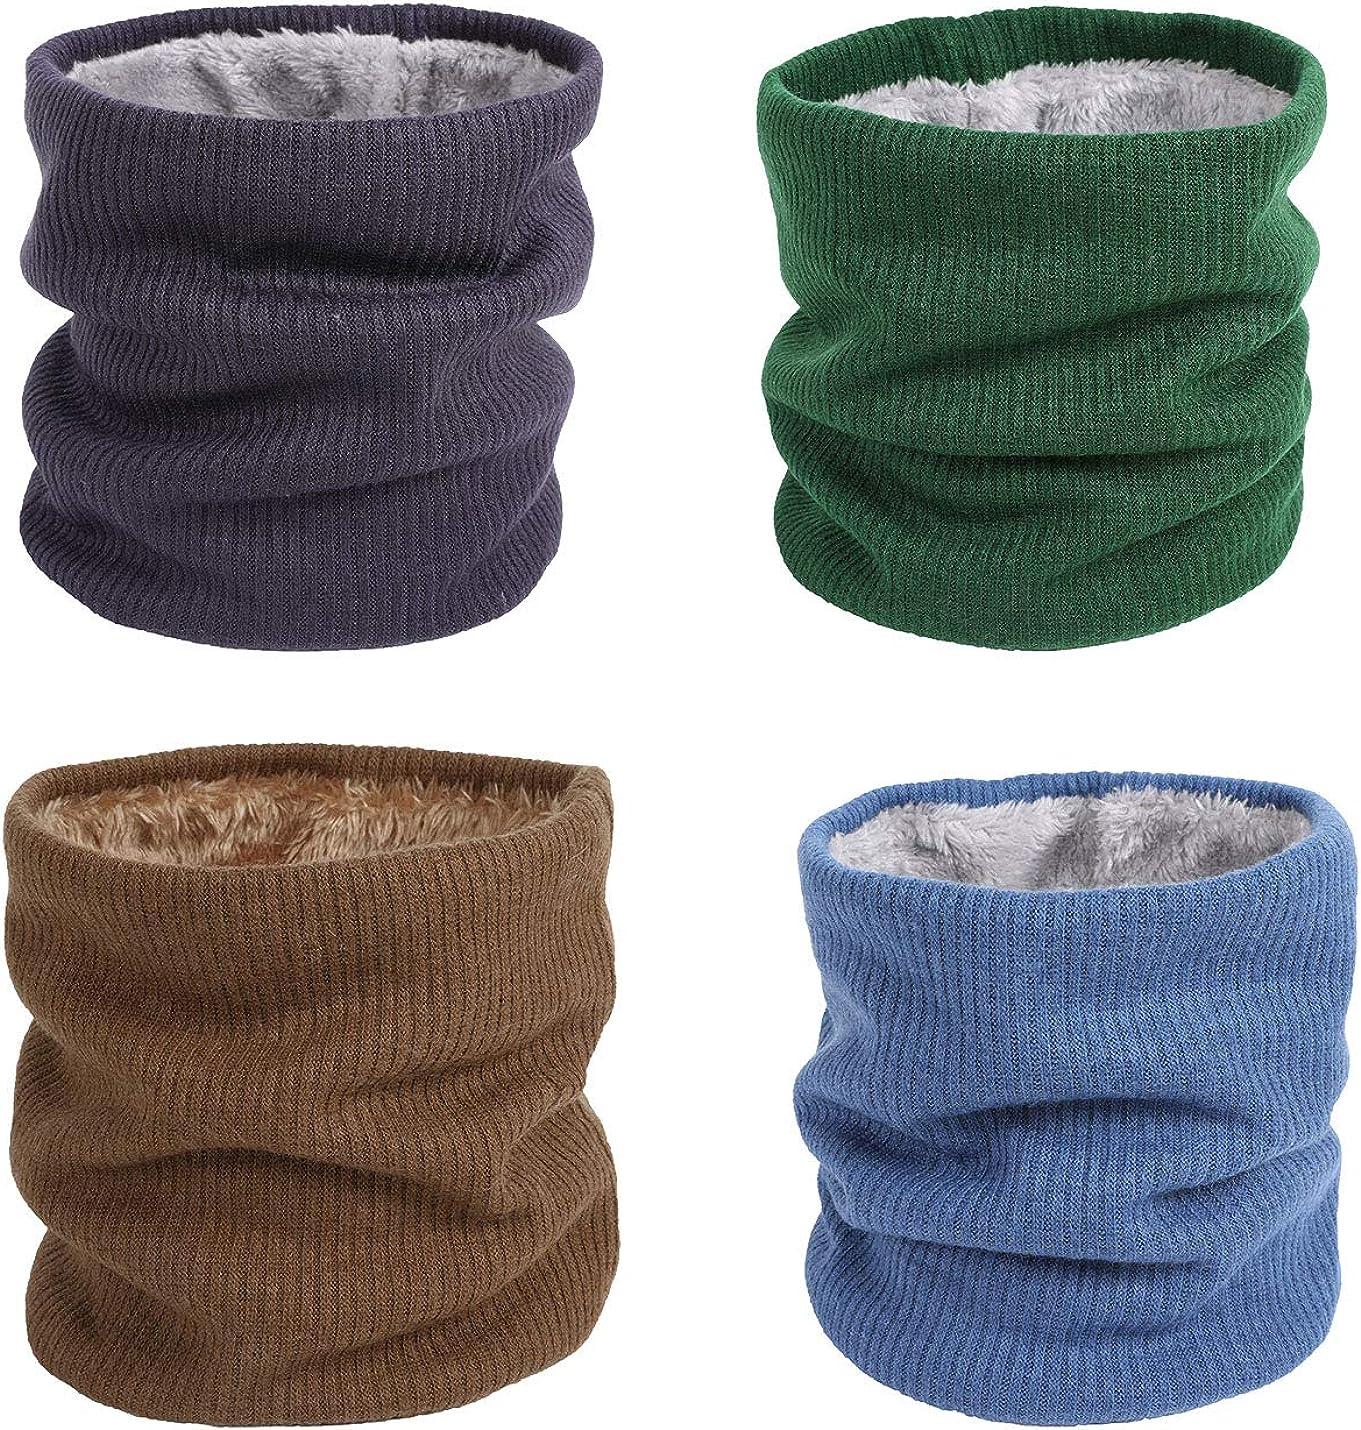 Flygo Women's Unisex Neck Warmer Fleece Lined Knit Circle Loop Scarf Gaiters